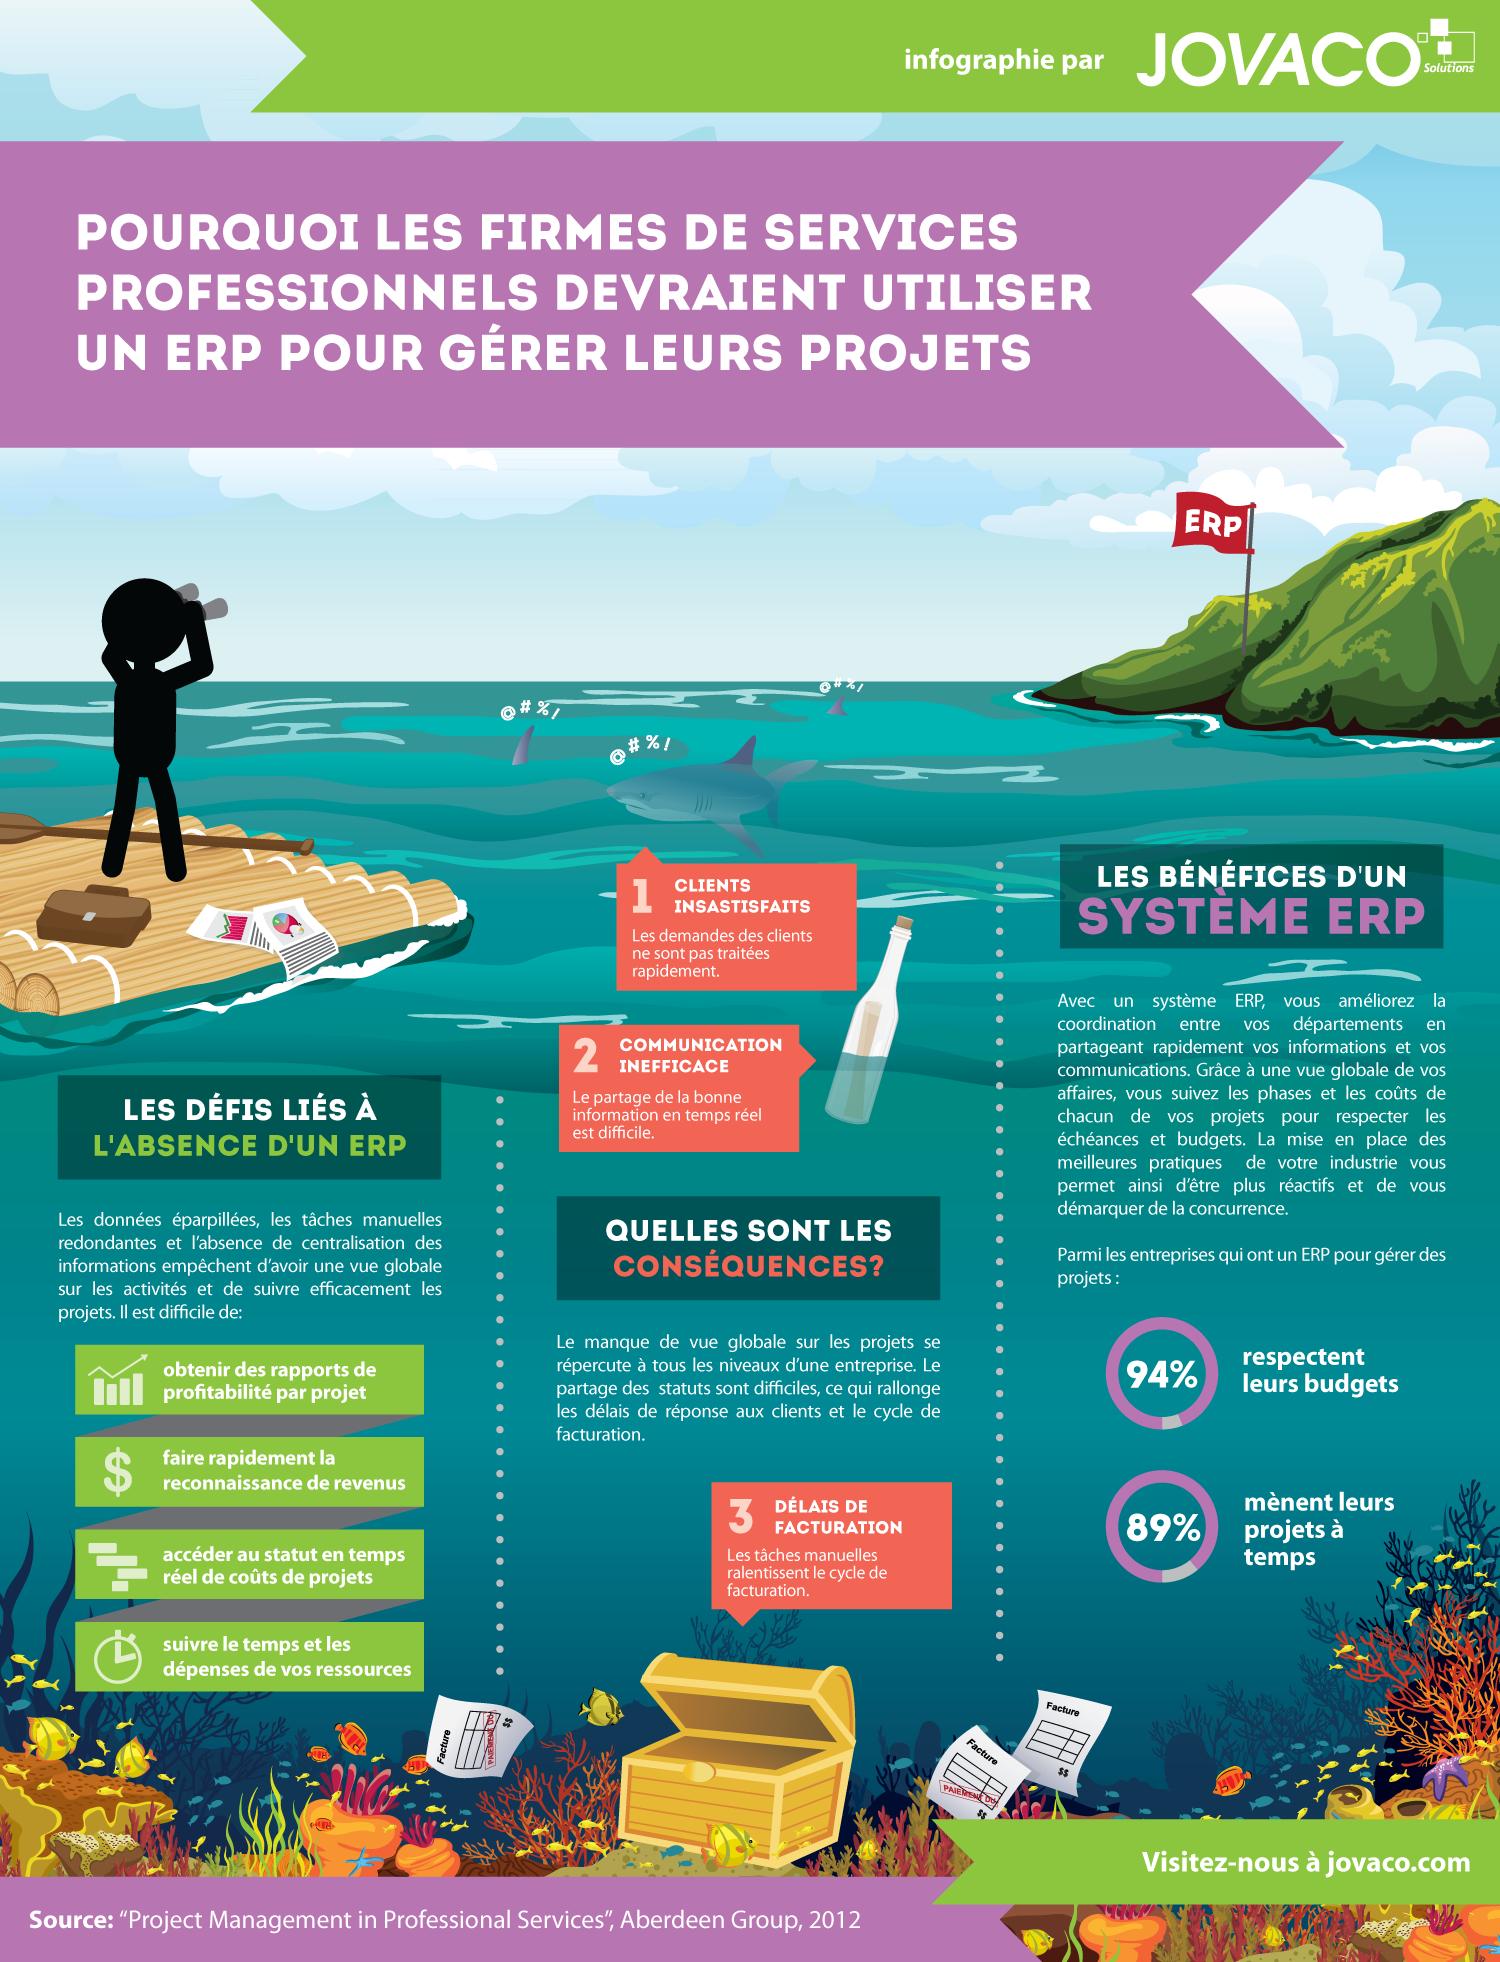 jovaco-solutions-infographie-pourquoi-utiliser-erp-gestion-projets